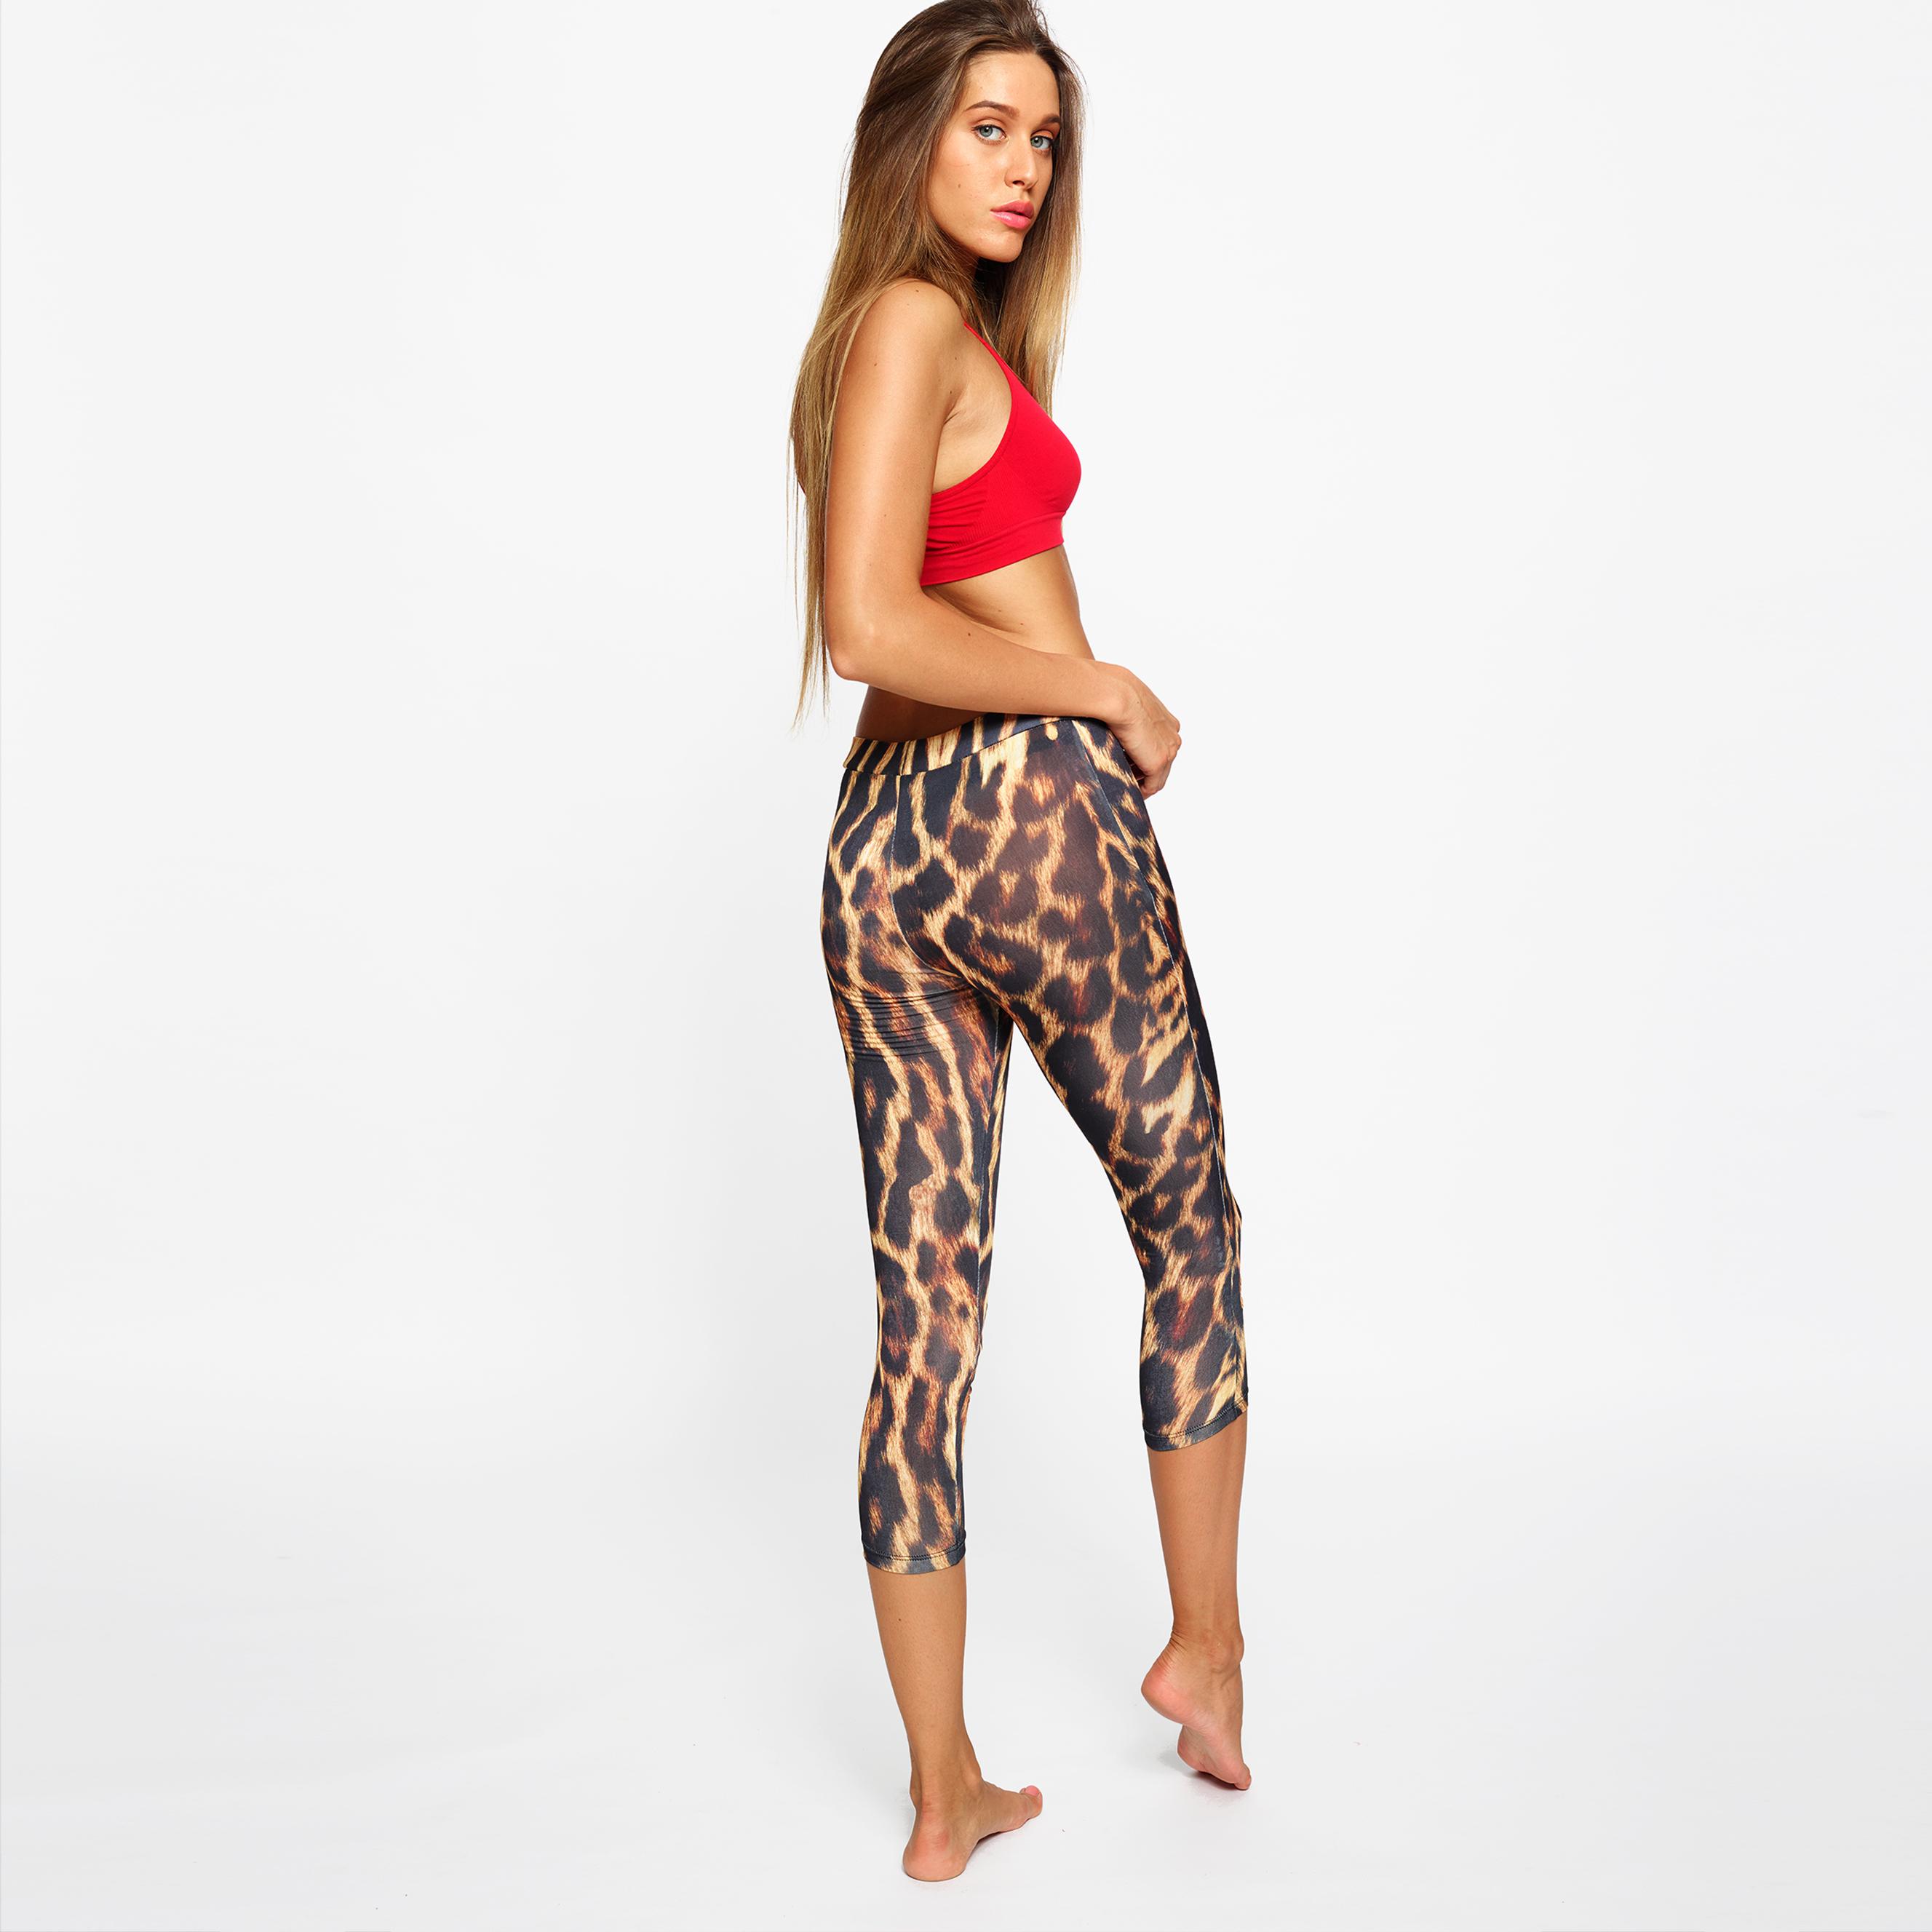 leggings fitness Yogashion stampa animalier